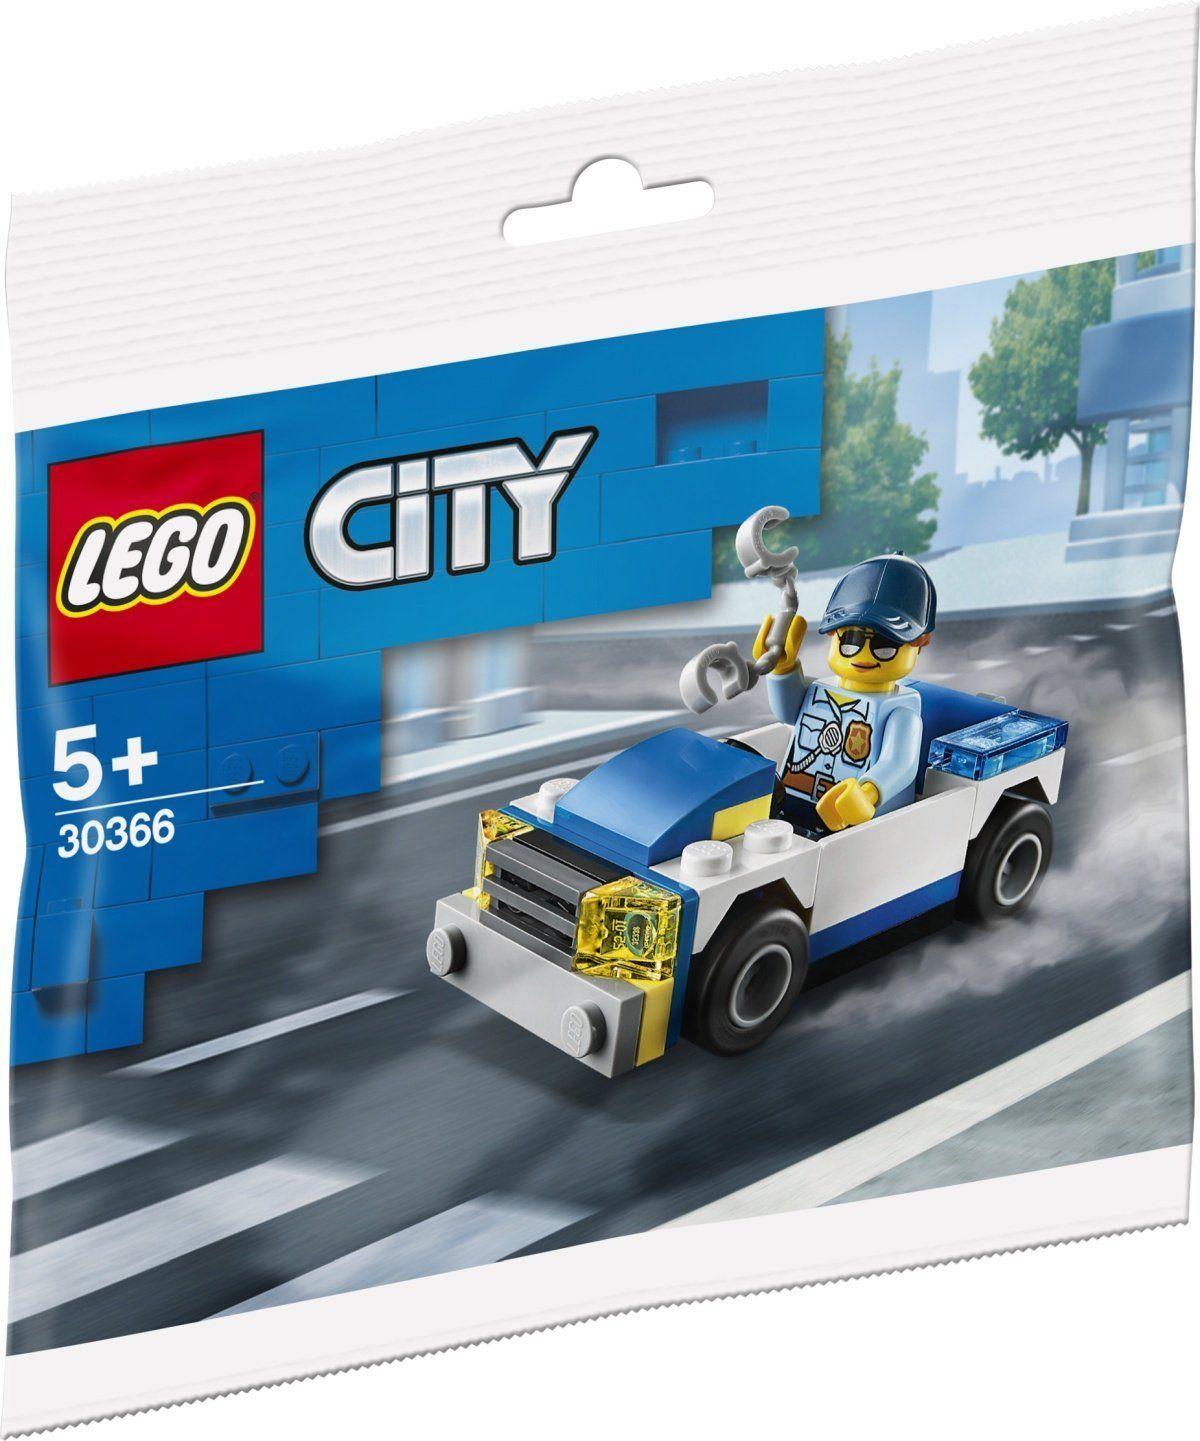 30366 1 Police Car In 2020 Lego Lego City Police Cars